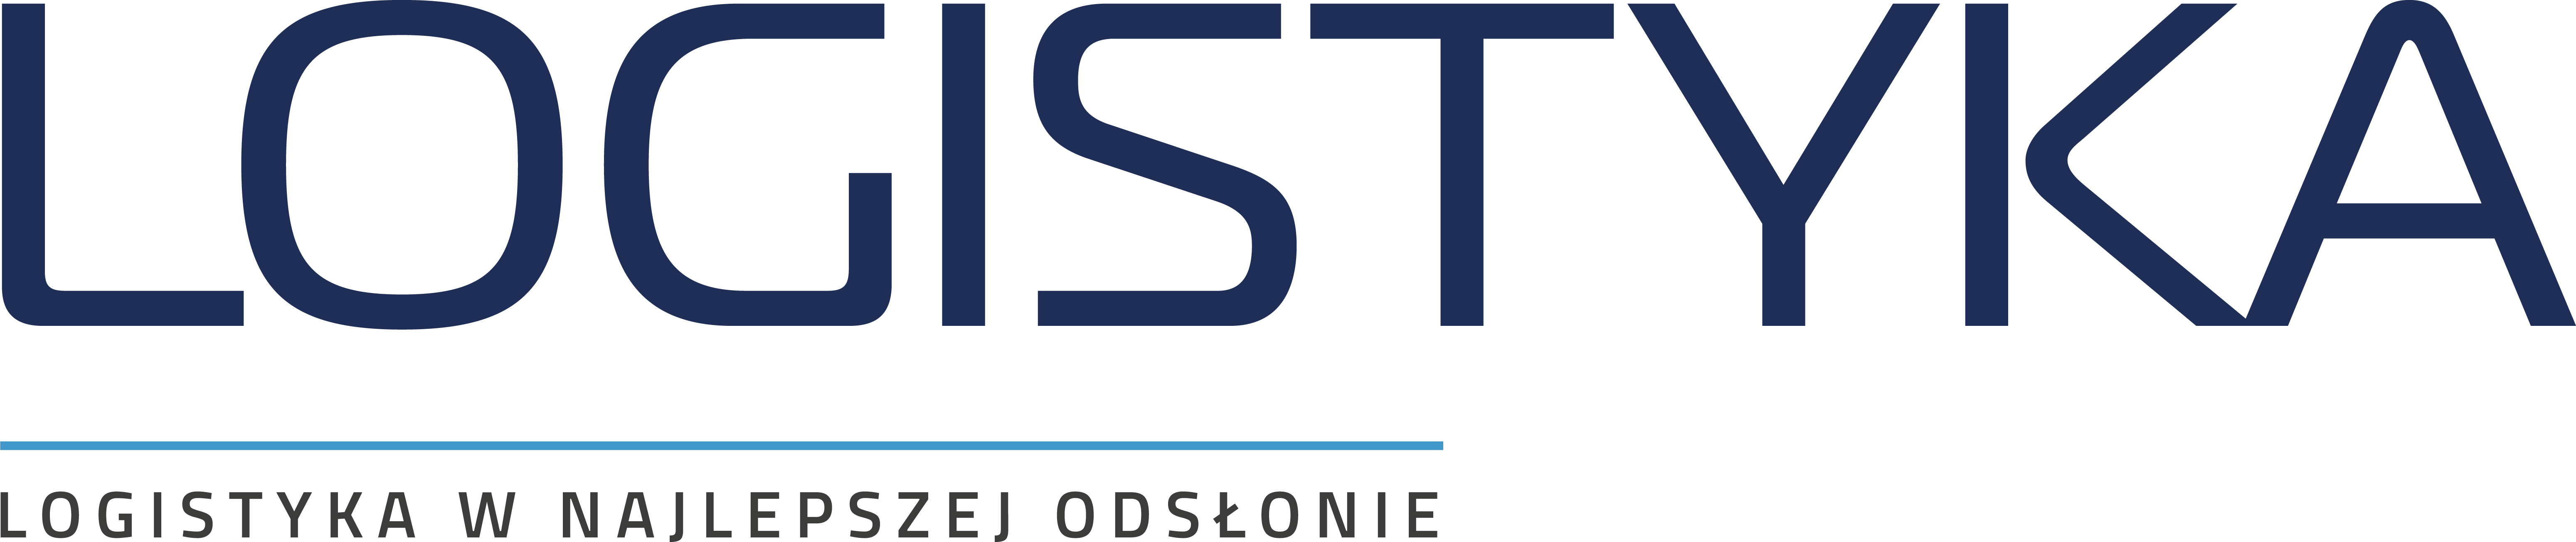 Logistyka.net.pl logo